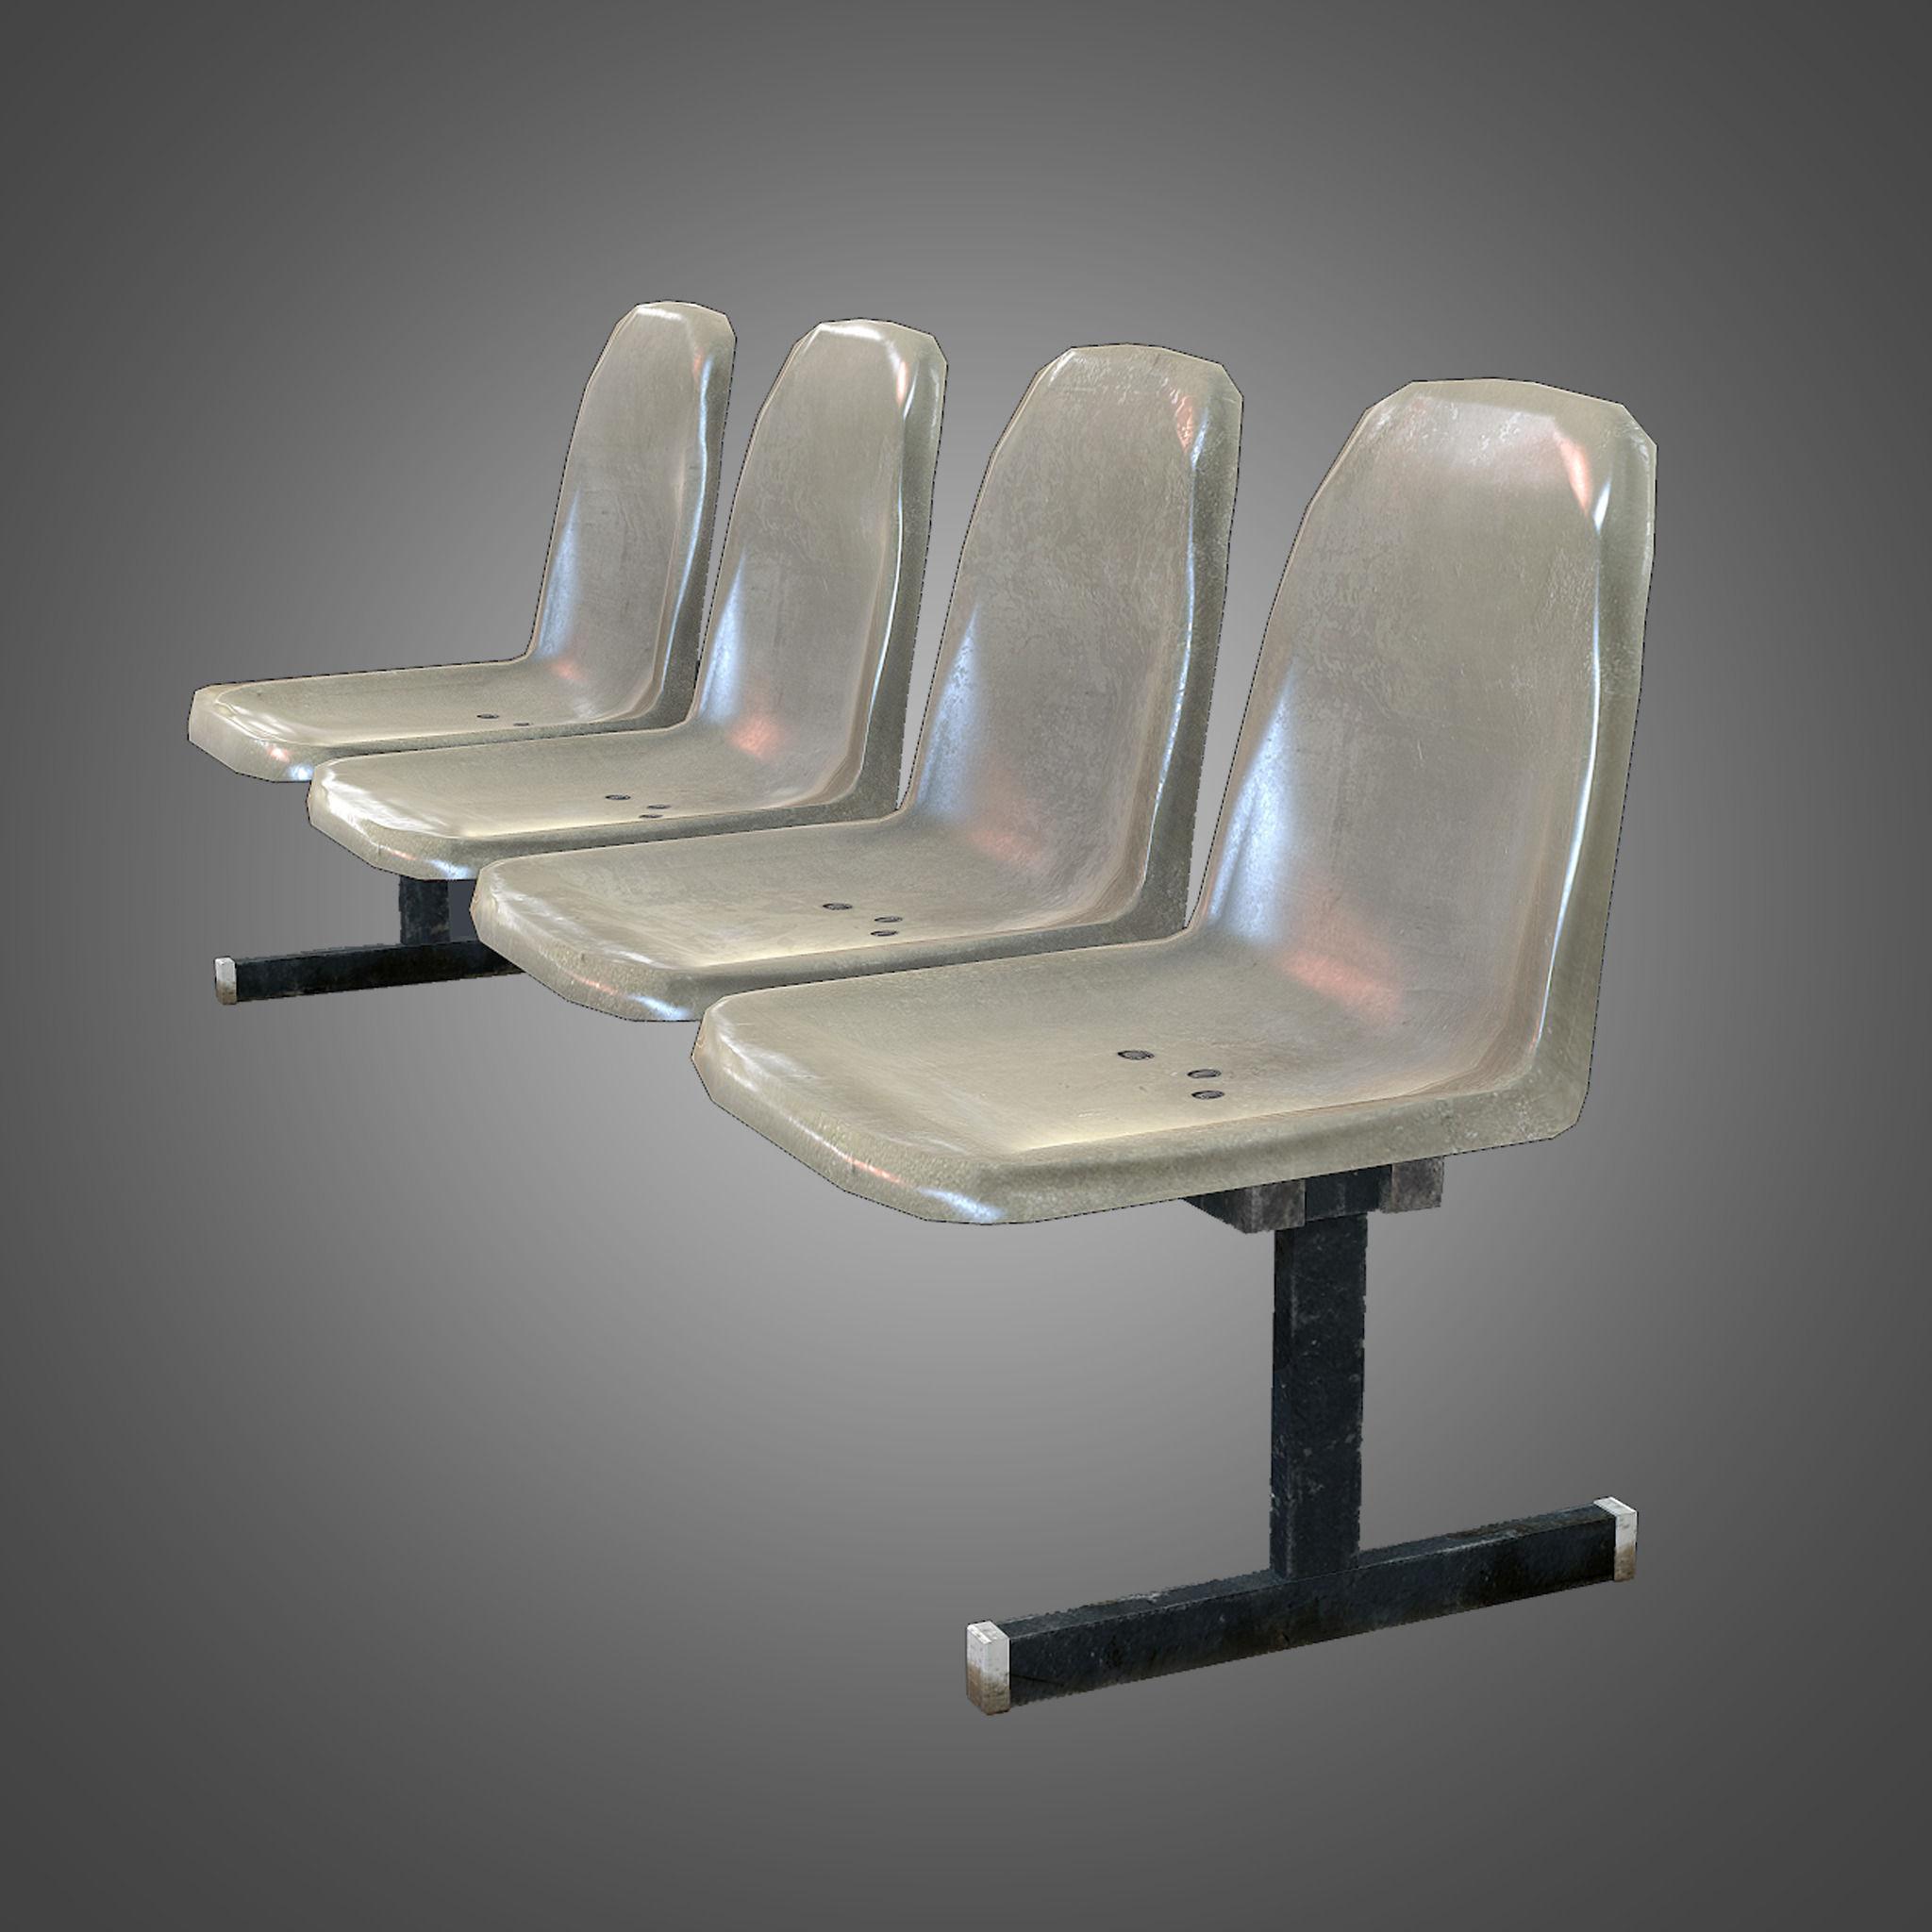 laundromat furniture. Laundromat Furniture. Bench Chairs 3d Model Low-poly Obj Fbx Ma Mb Tga Furniture R